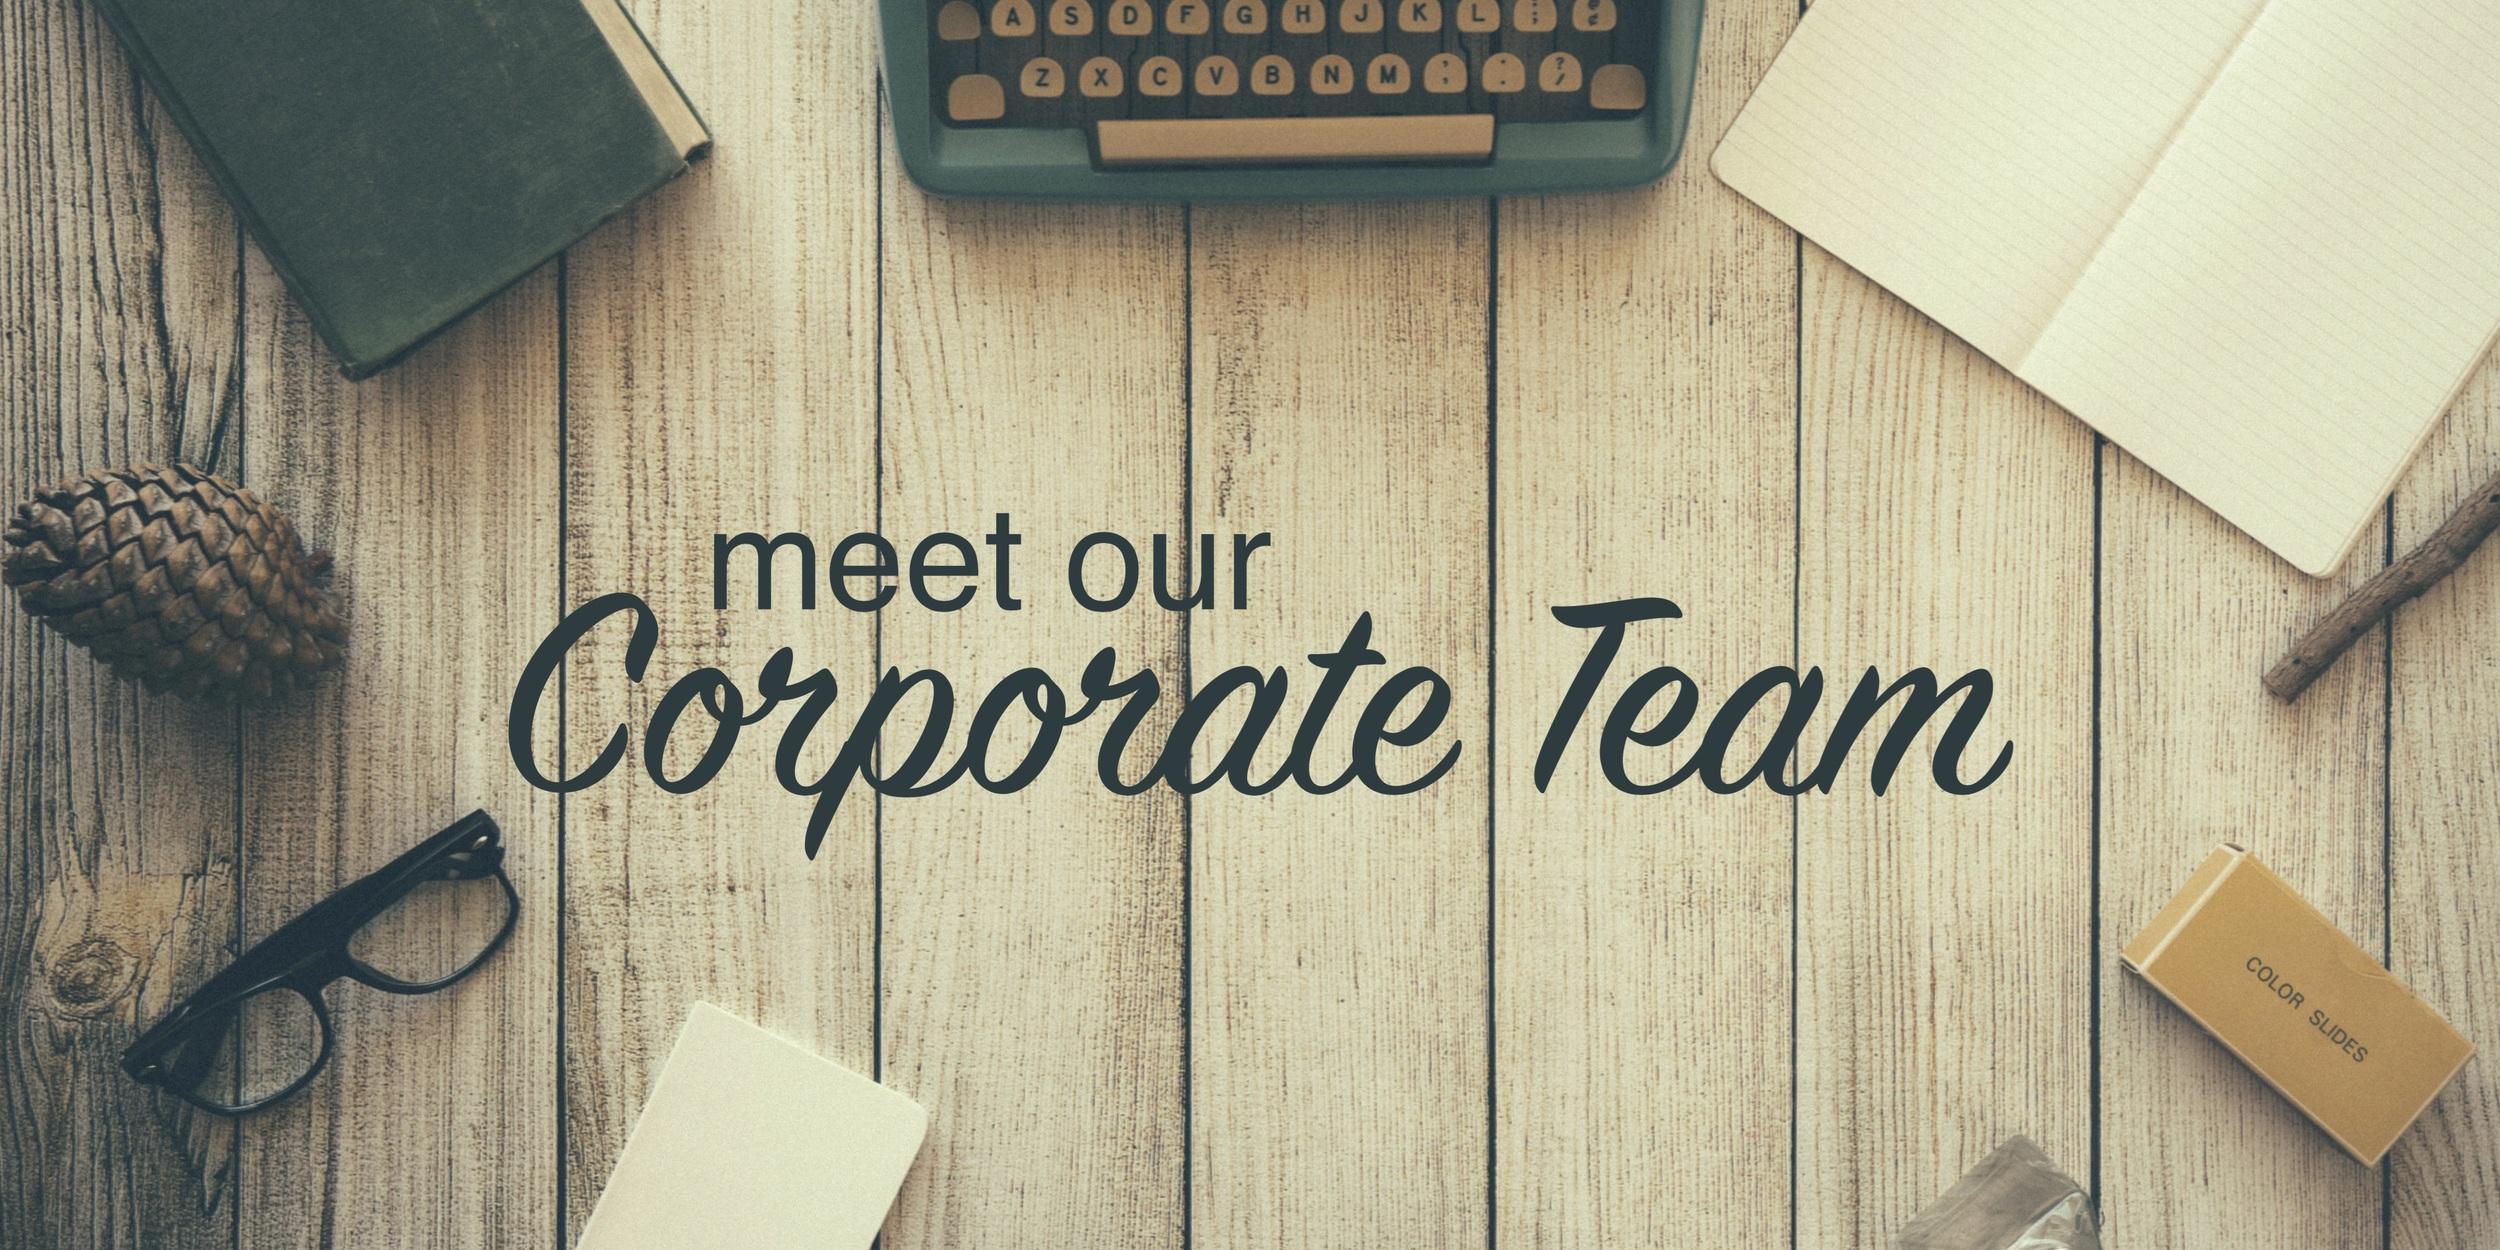 meet our corporate team copy.jpg